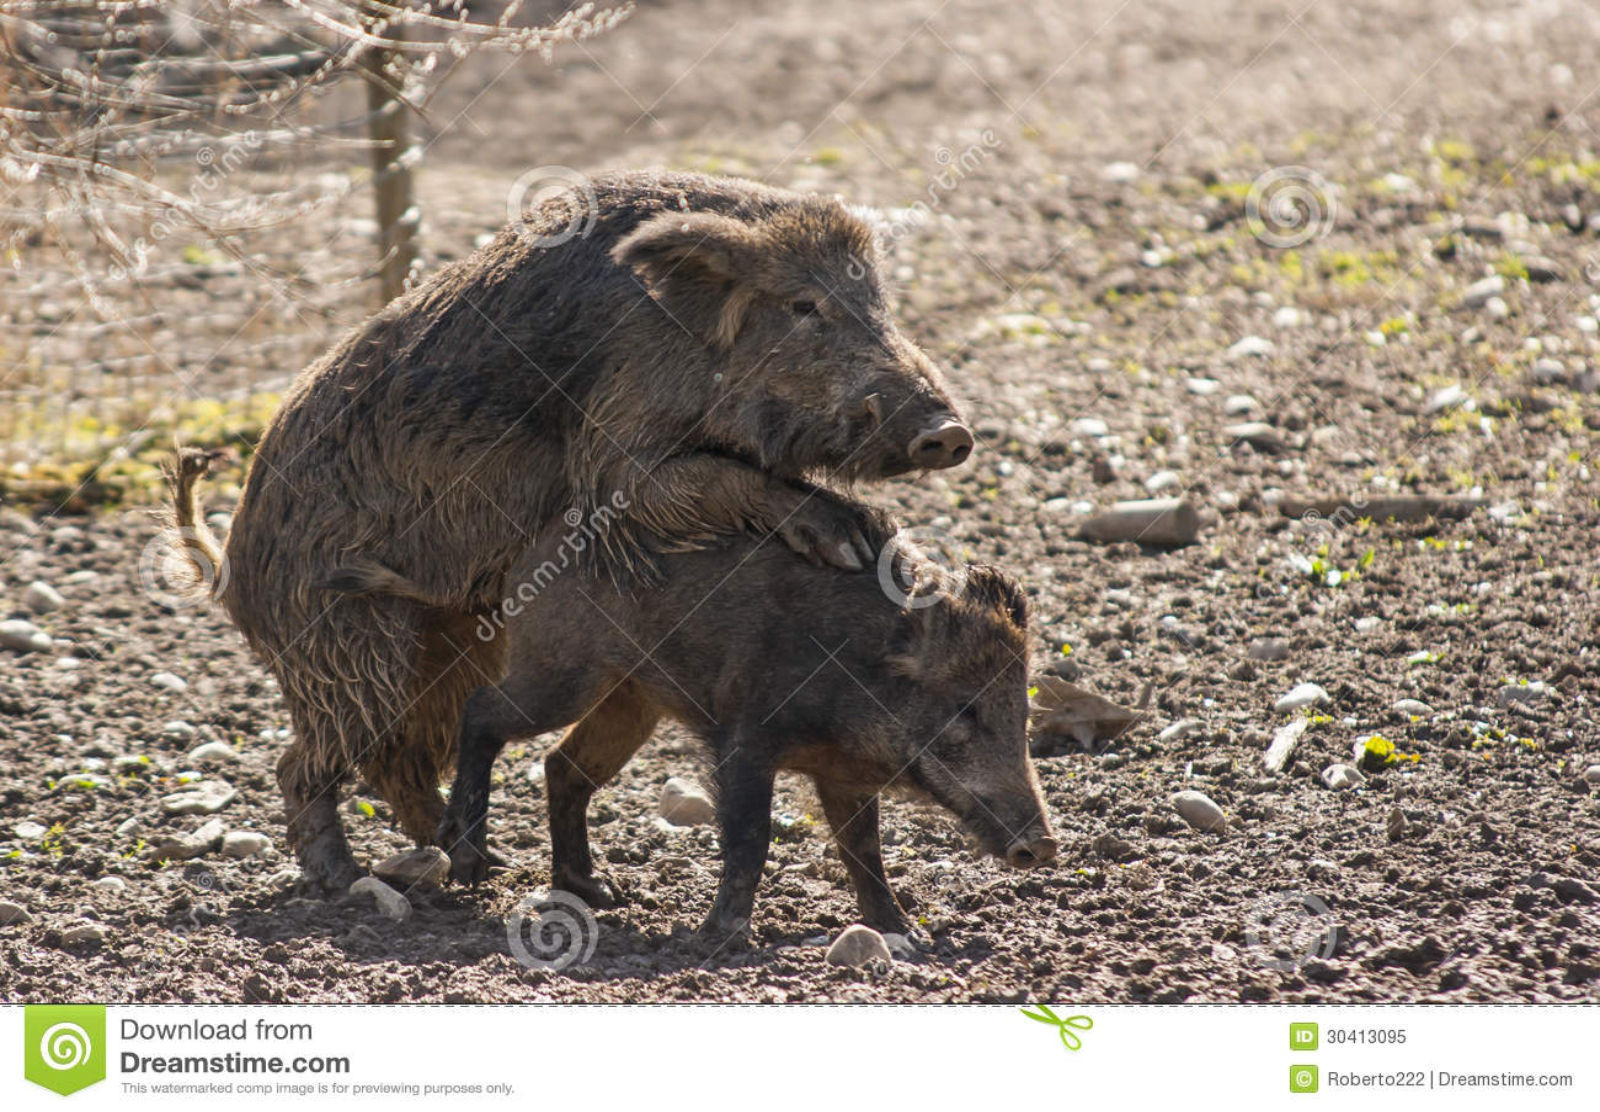 Free boar sex speak this